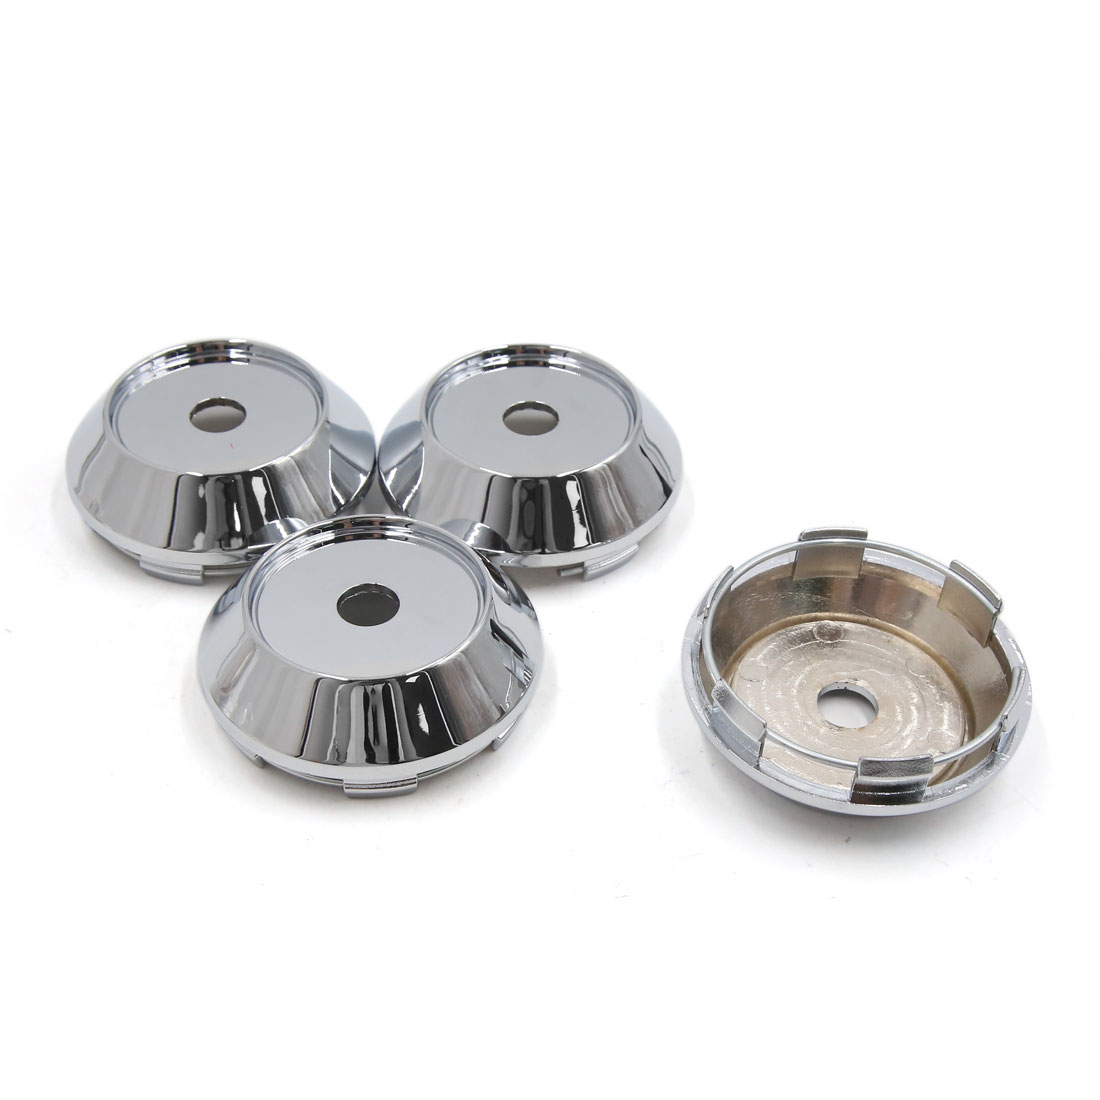 4 Pcs Silver Tone Chrome 68mm Dia 6 Lugs Car Wheel Rims Center Cap Hub Cover